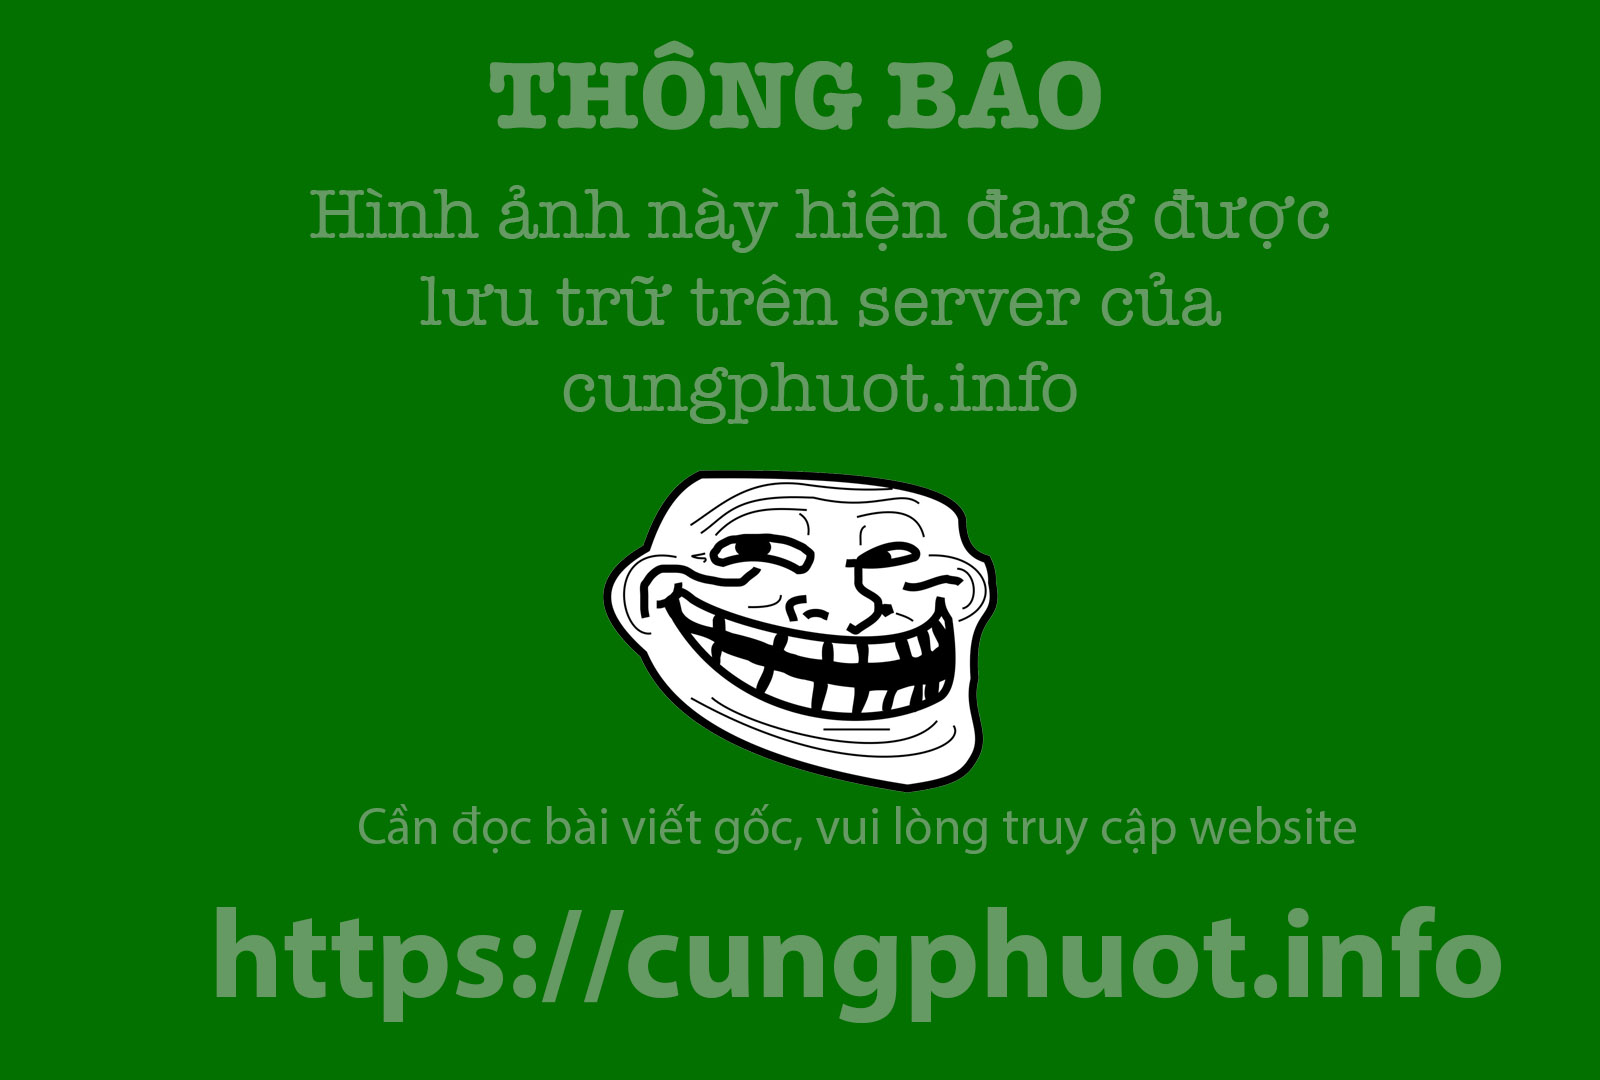 Den Moc Chau san mai anh dao hinh anh 4